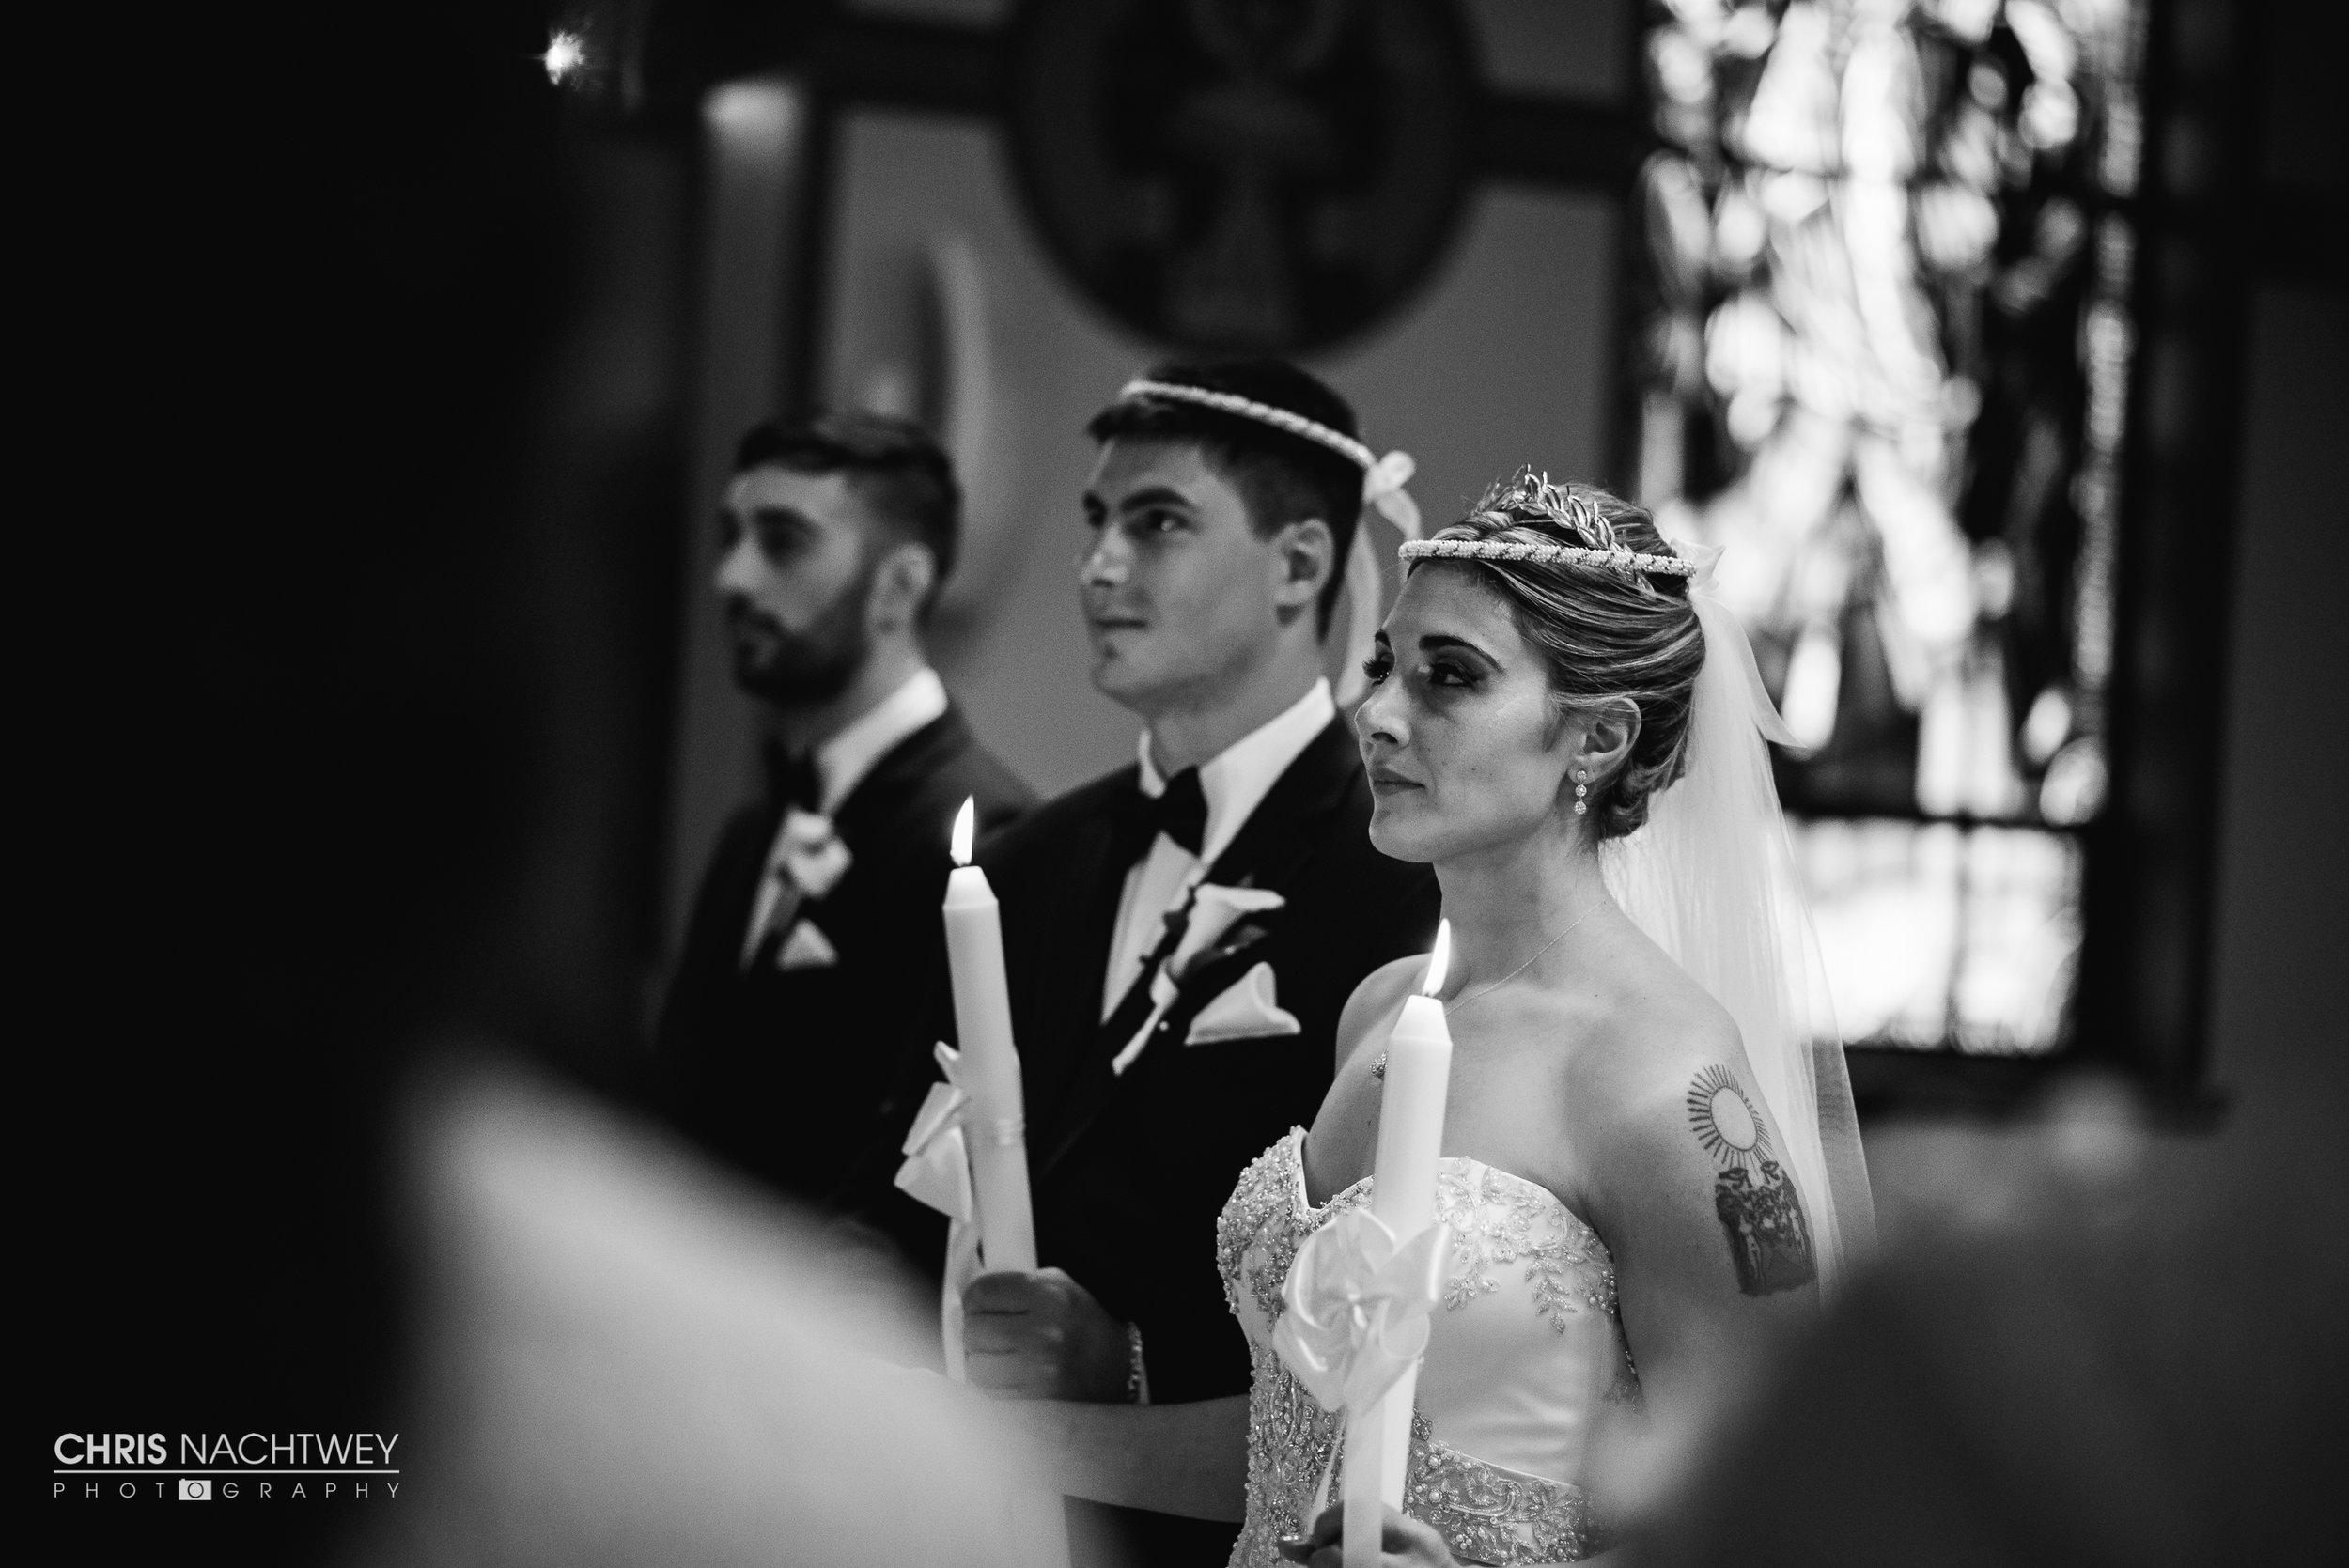 mystic-artistic-wedding-photographer-chris-nachtwey-2017-12.jpg